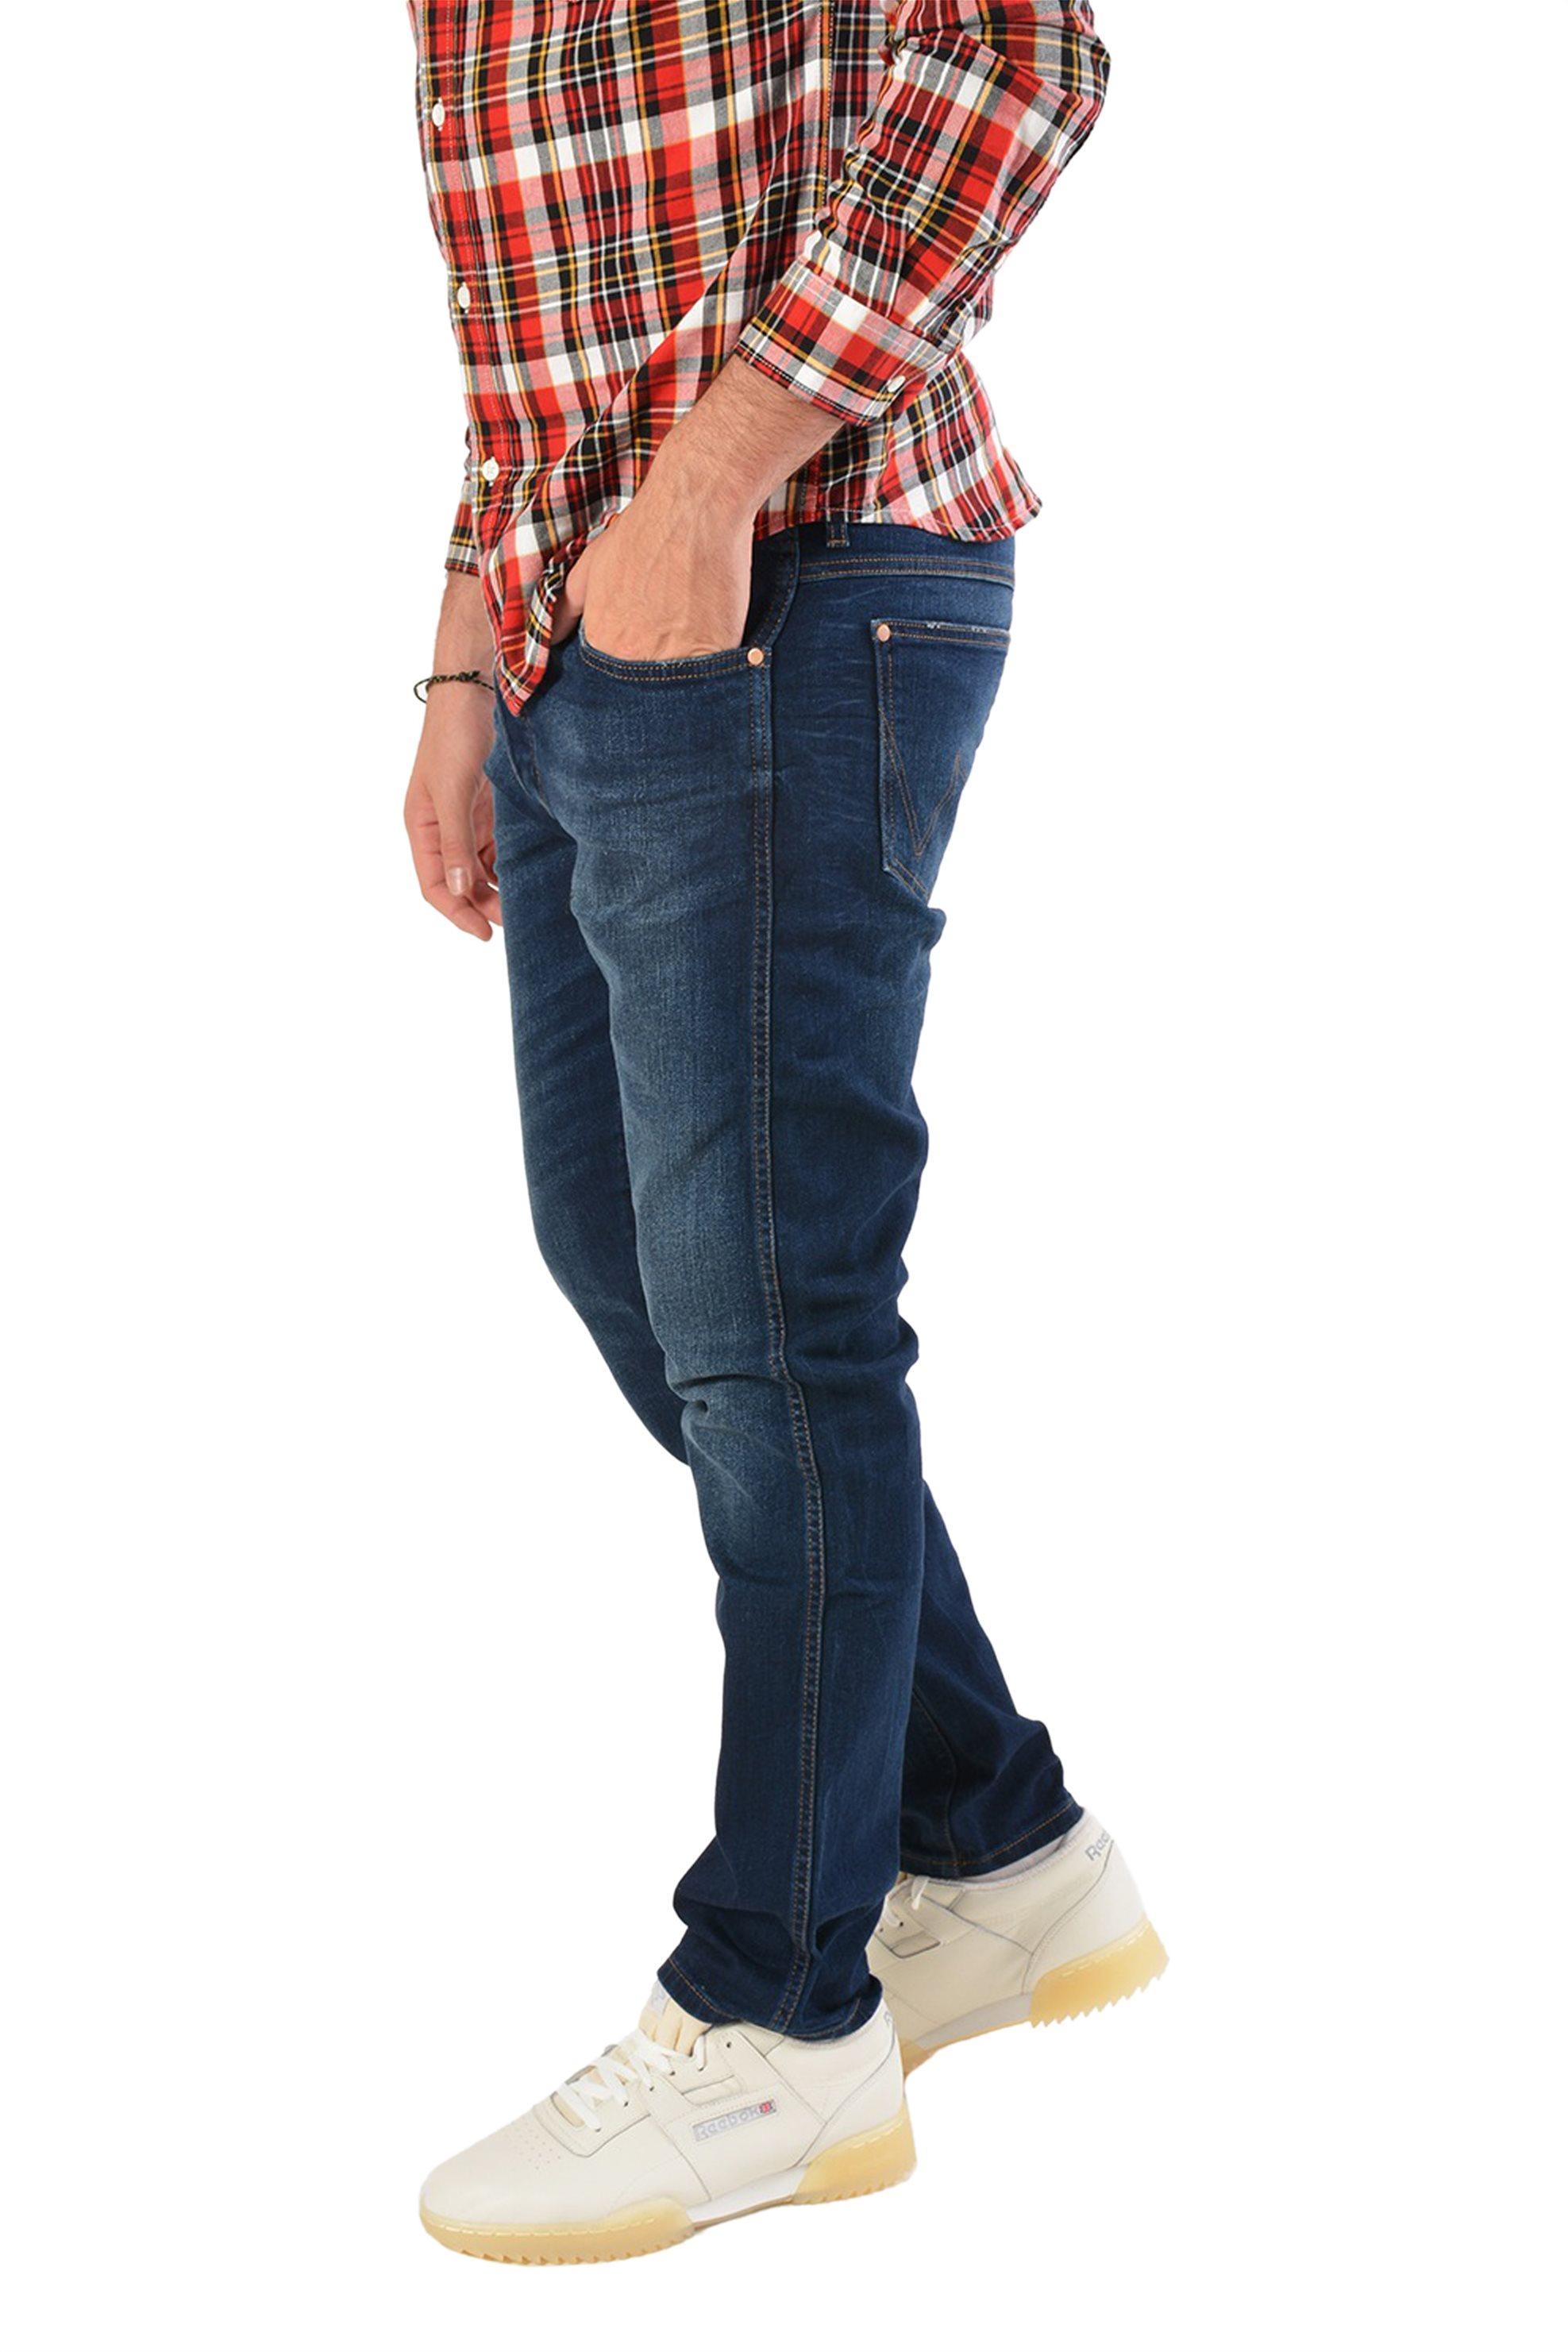 Wrangler ανδρικό τζην παντελόνι Slider Sin Bin - W18RRS24N - Μπλε Σκούρο ανδρασ   ρουχα   jeans   tapered